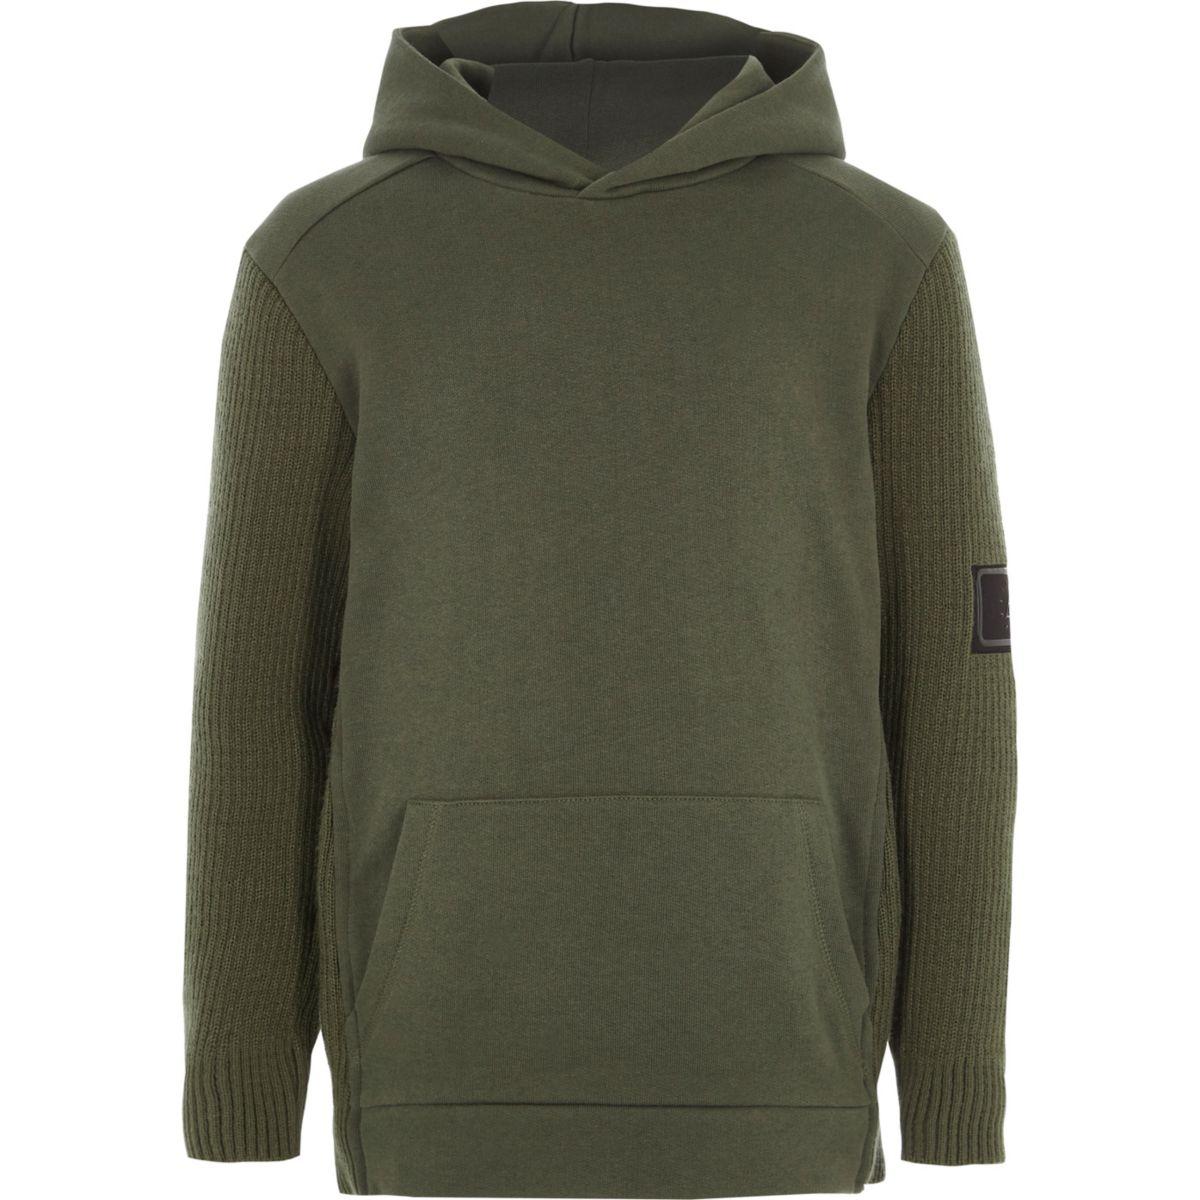 Boys khaki knit sleeve hoodie